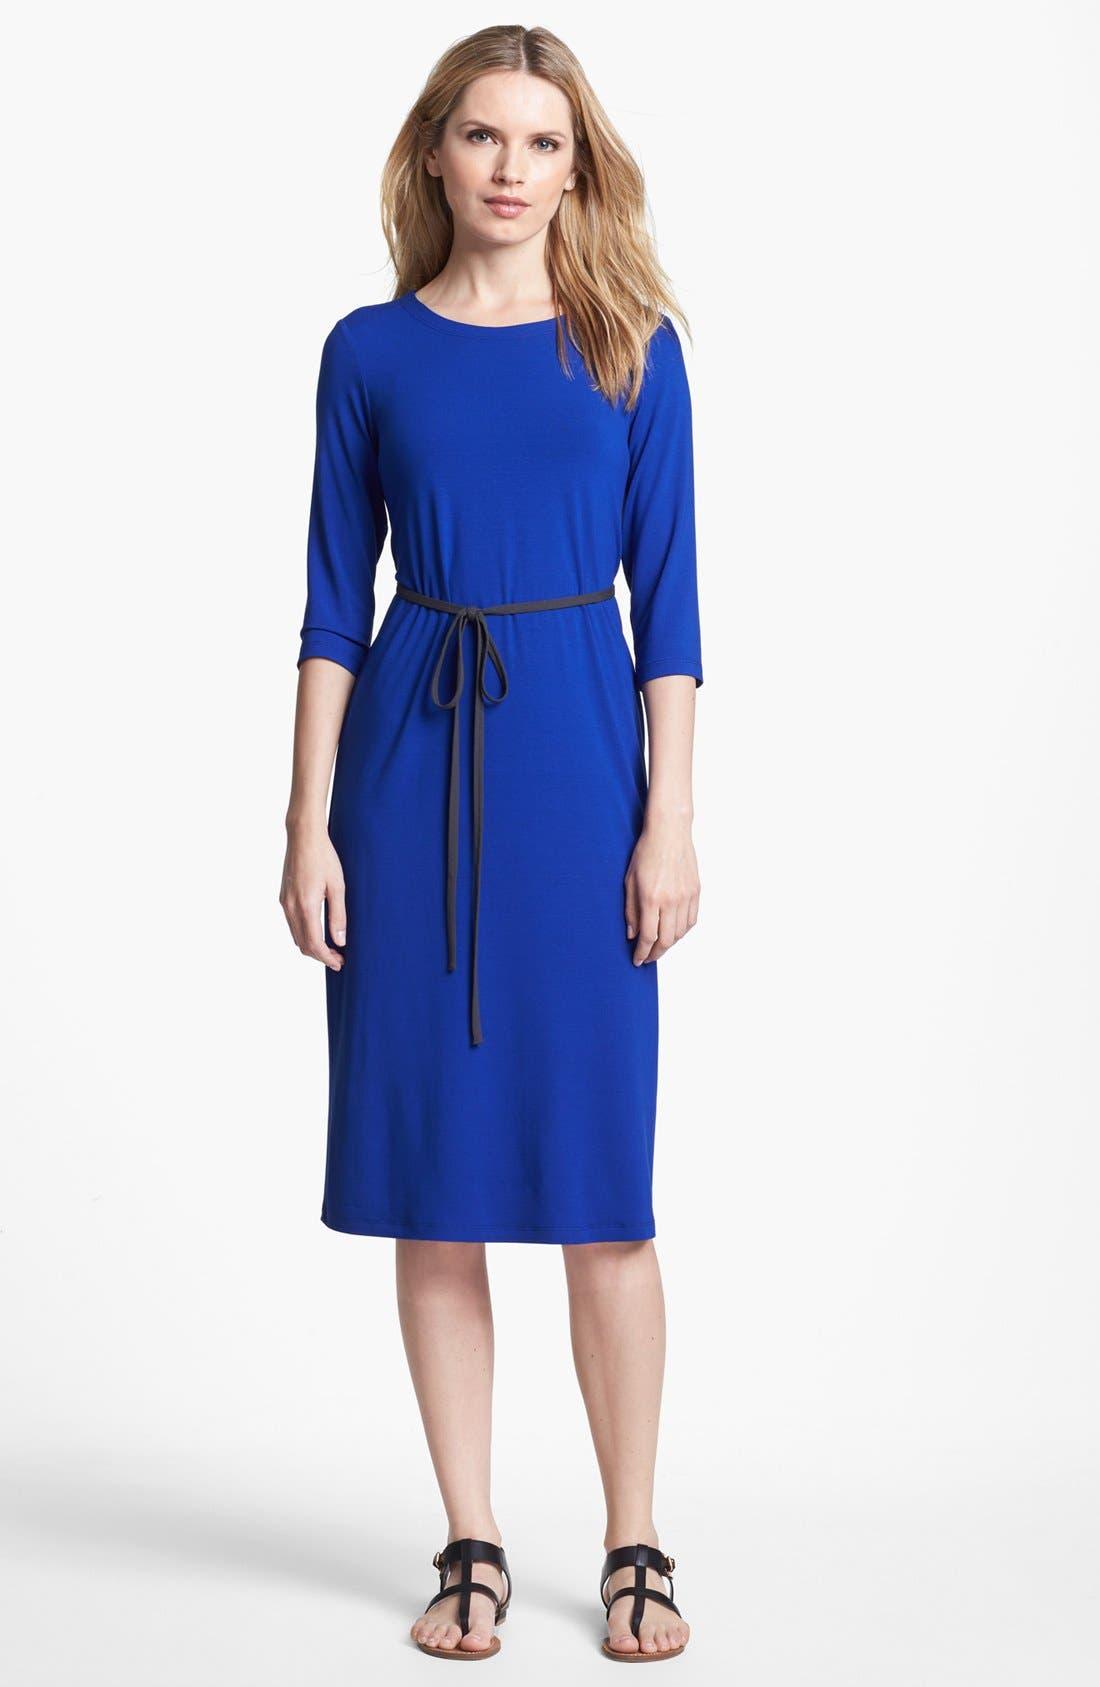 Alternate Image 1 Selected - Eileen Fisher Elbow Sleeve Dress